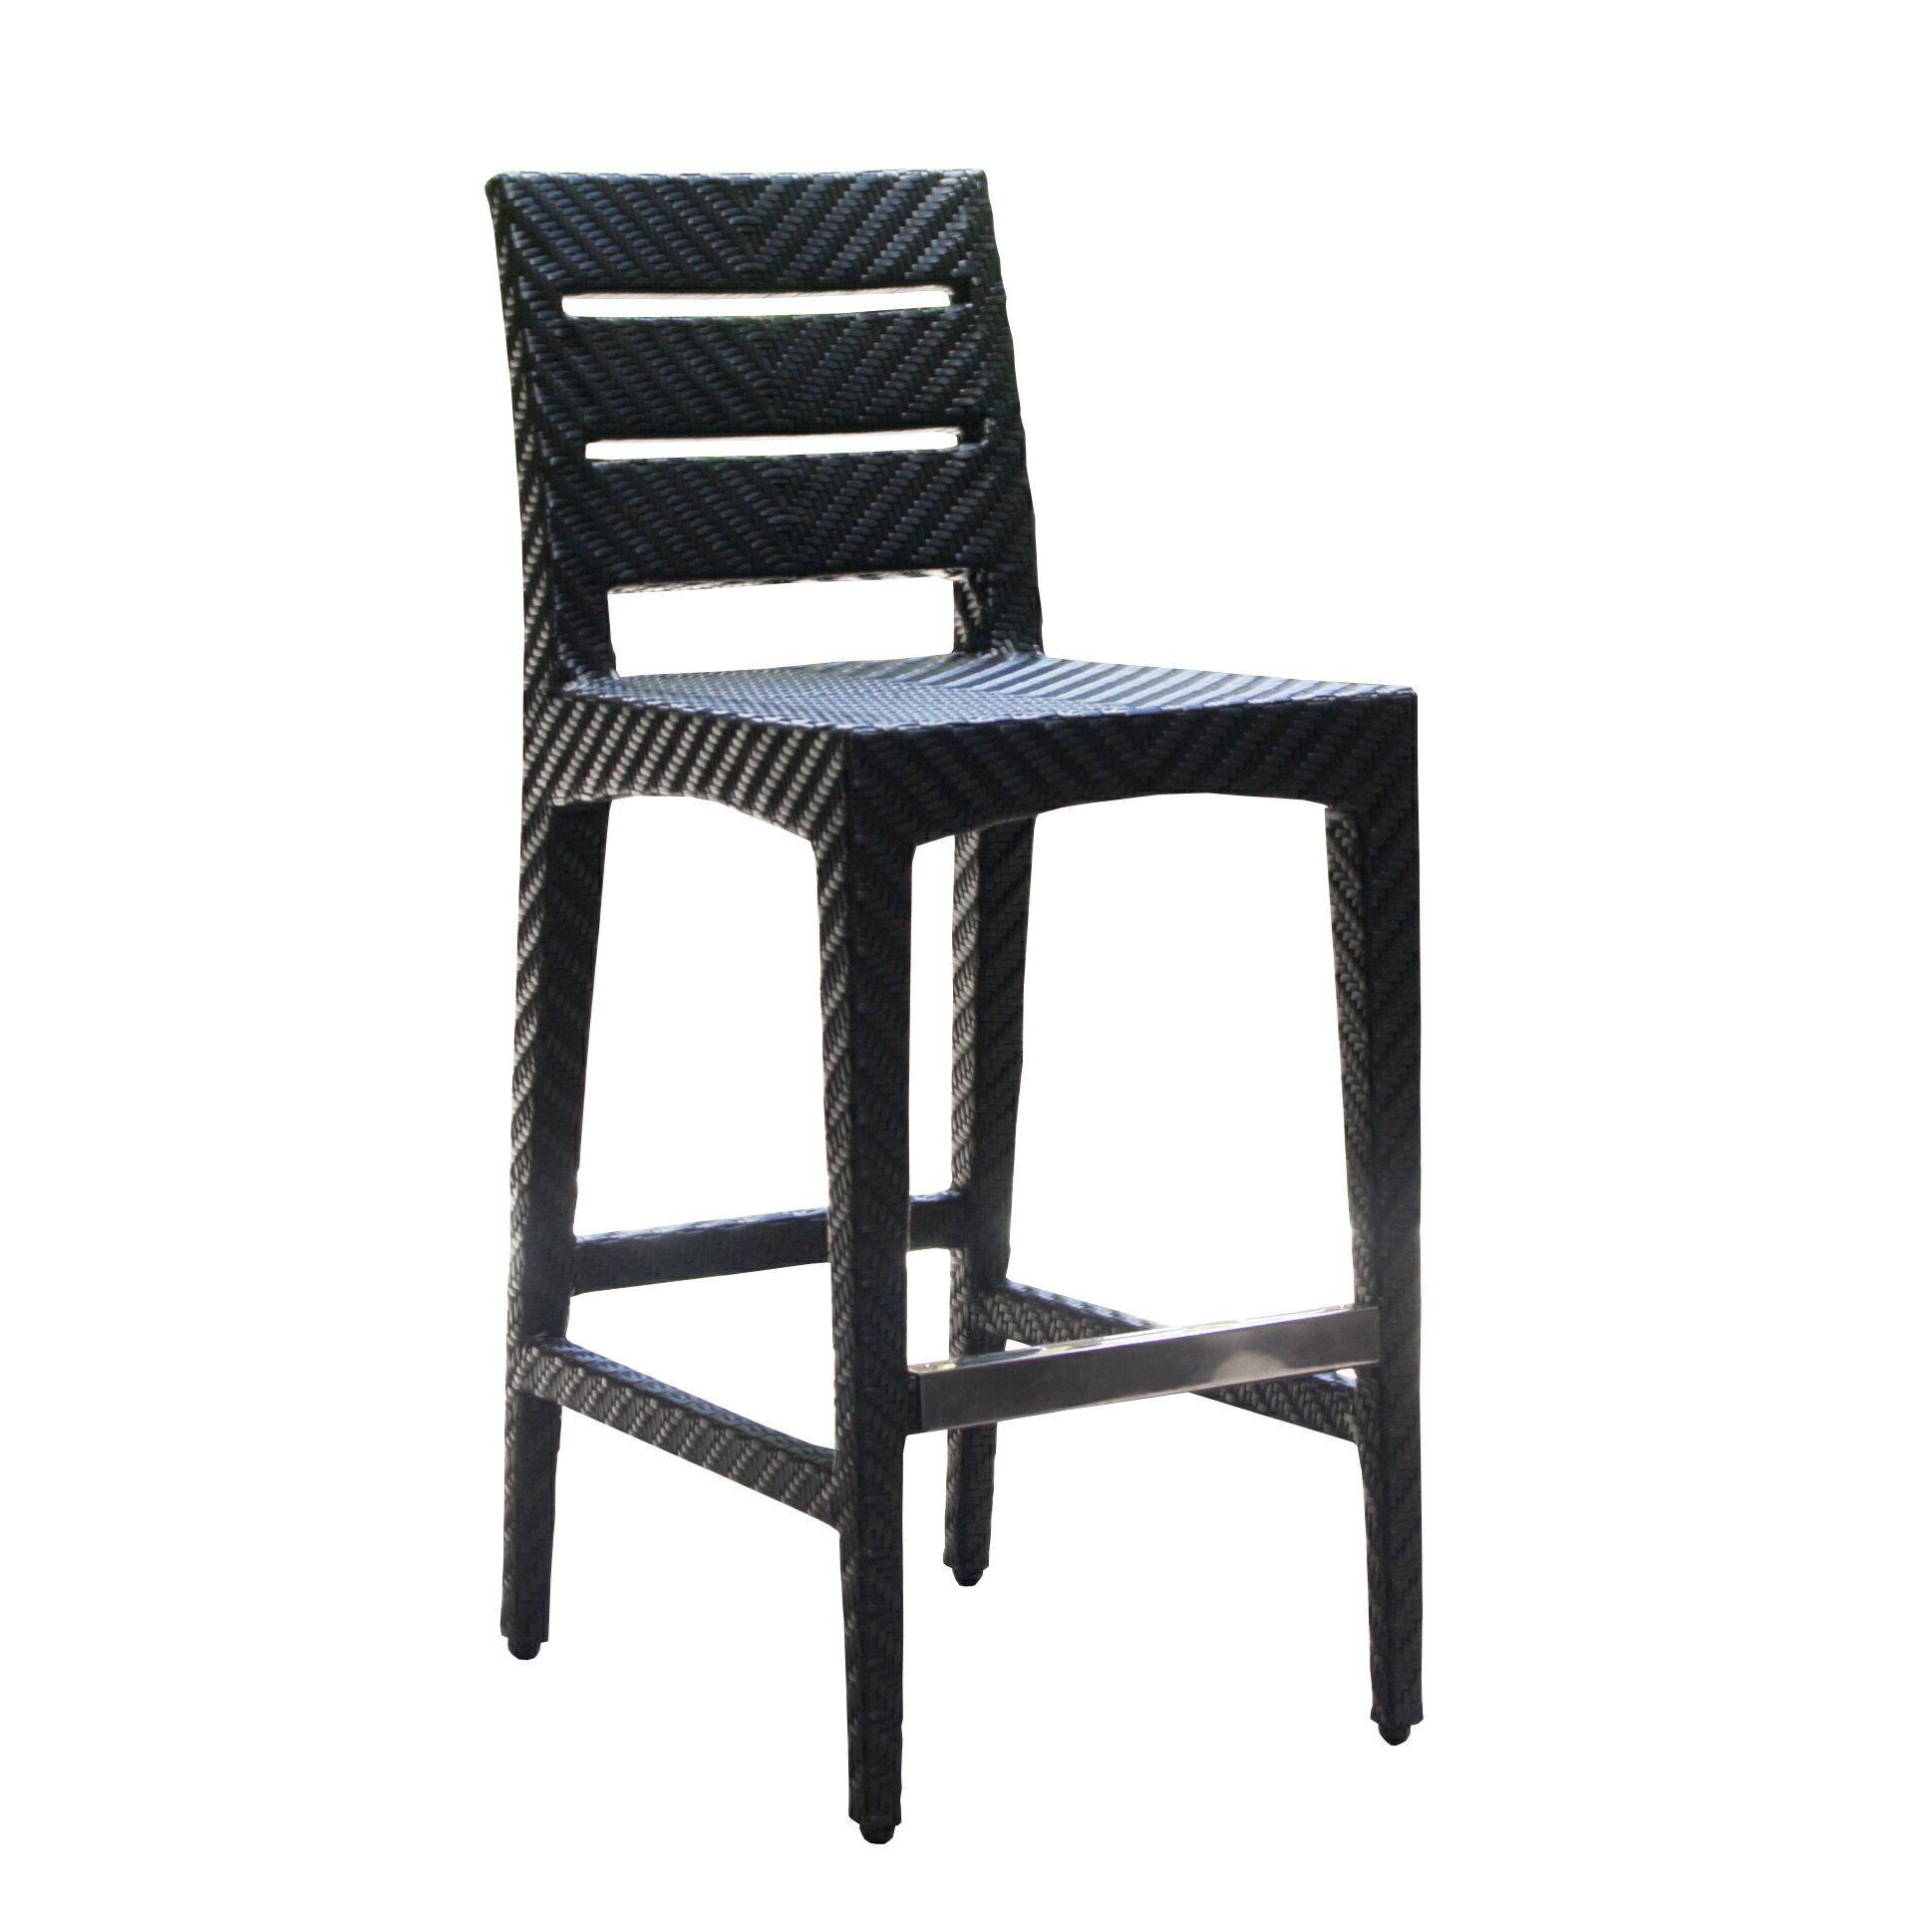 PANAMERA 帕納米 吧檯椅 戶外家具【7OCEANS七海休閒傢俱】EXPRESSO 黑褐色 0